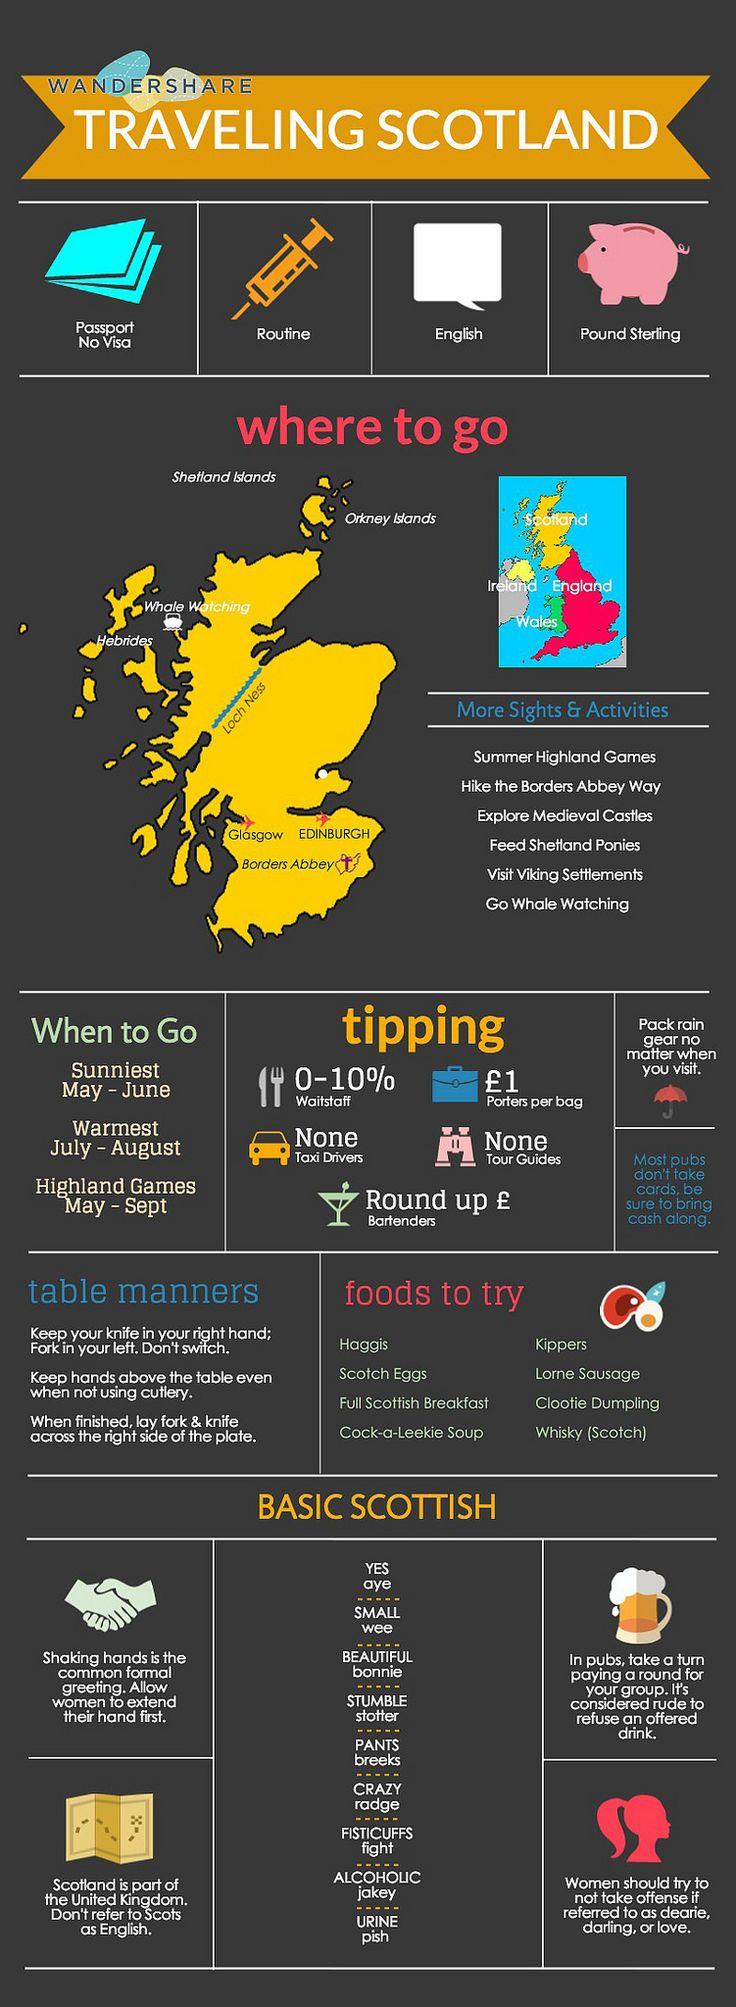 https://flic.kr/p/qGV2zU | Wandershare.com - Traveling Scotland